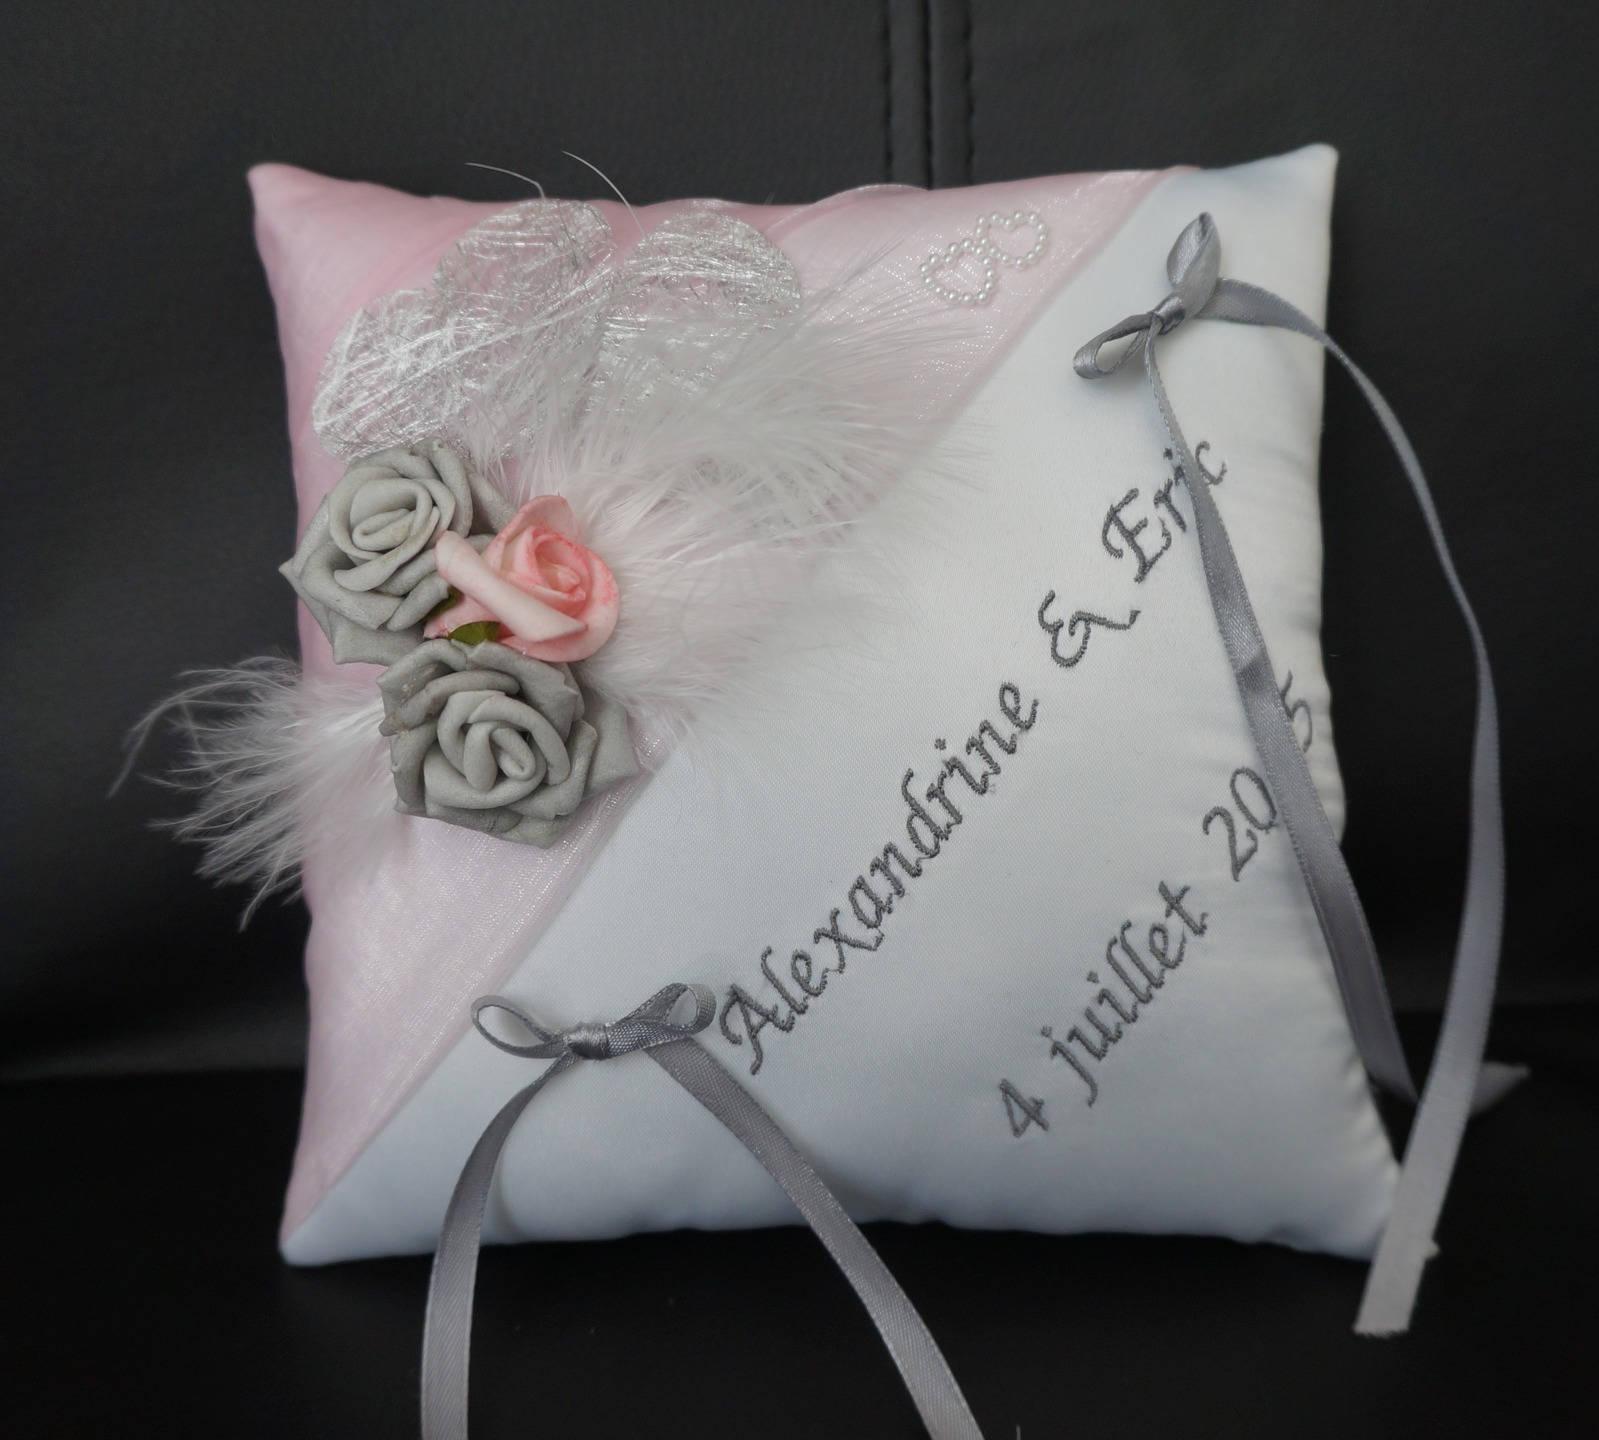 coussin porte alliance ivoire et rose pale. Black Bedroom Furniture Sets. Home Design Ideas